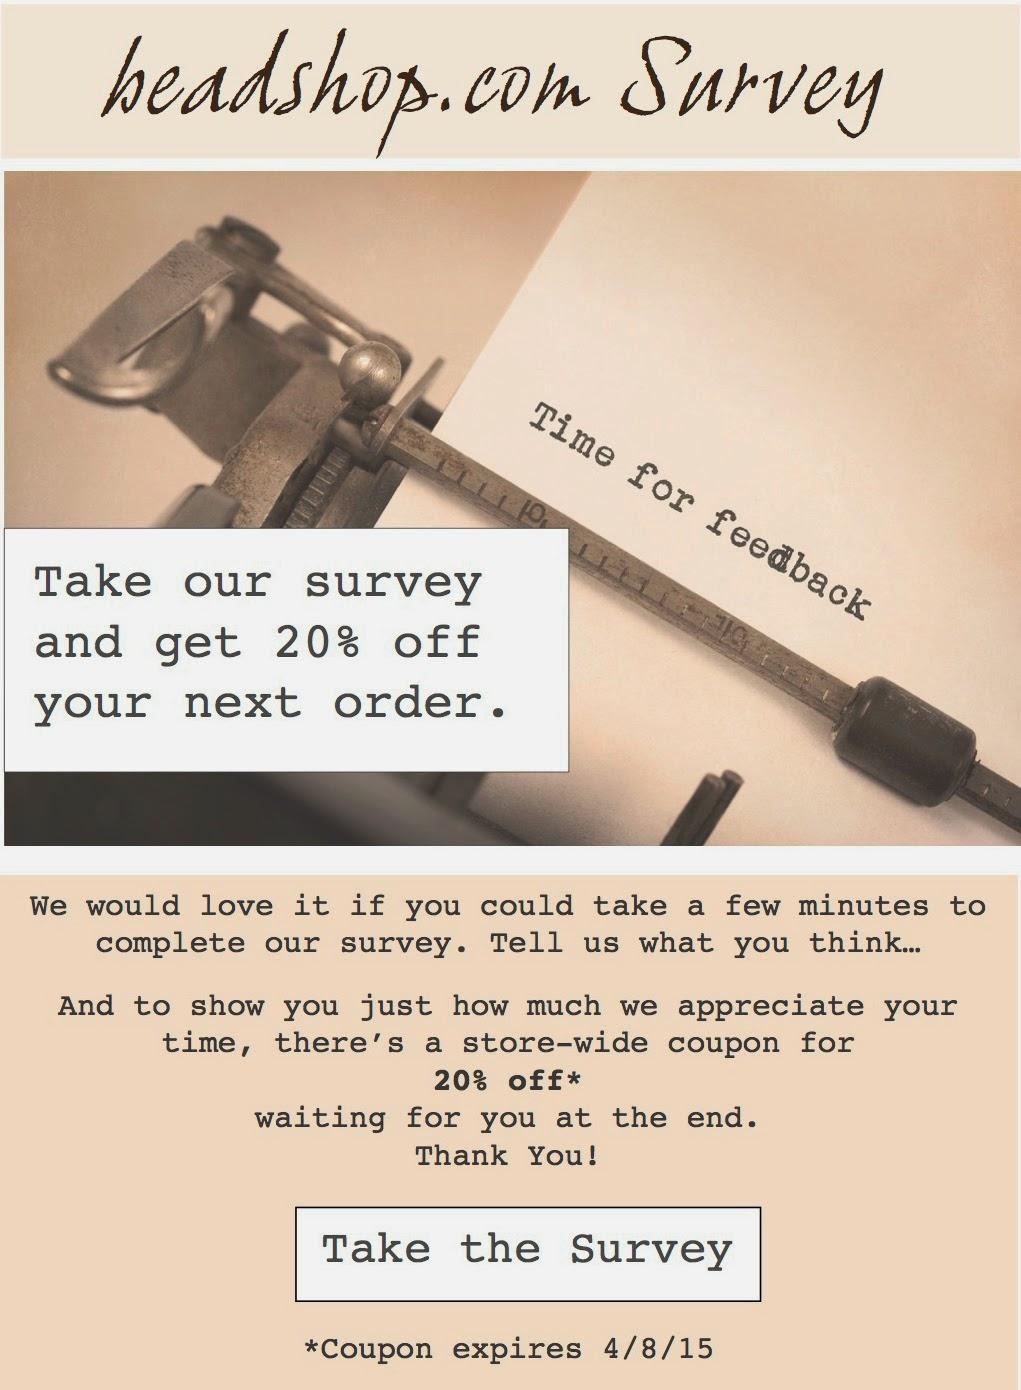 http://survey.constantcontact.com/survey/a07easj4glqi7xu85yg/start